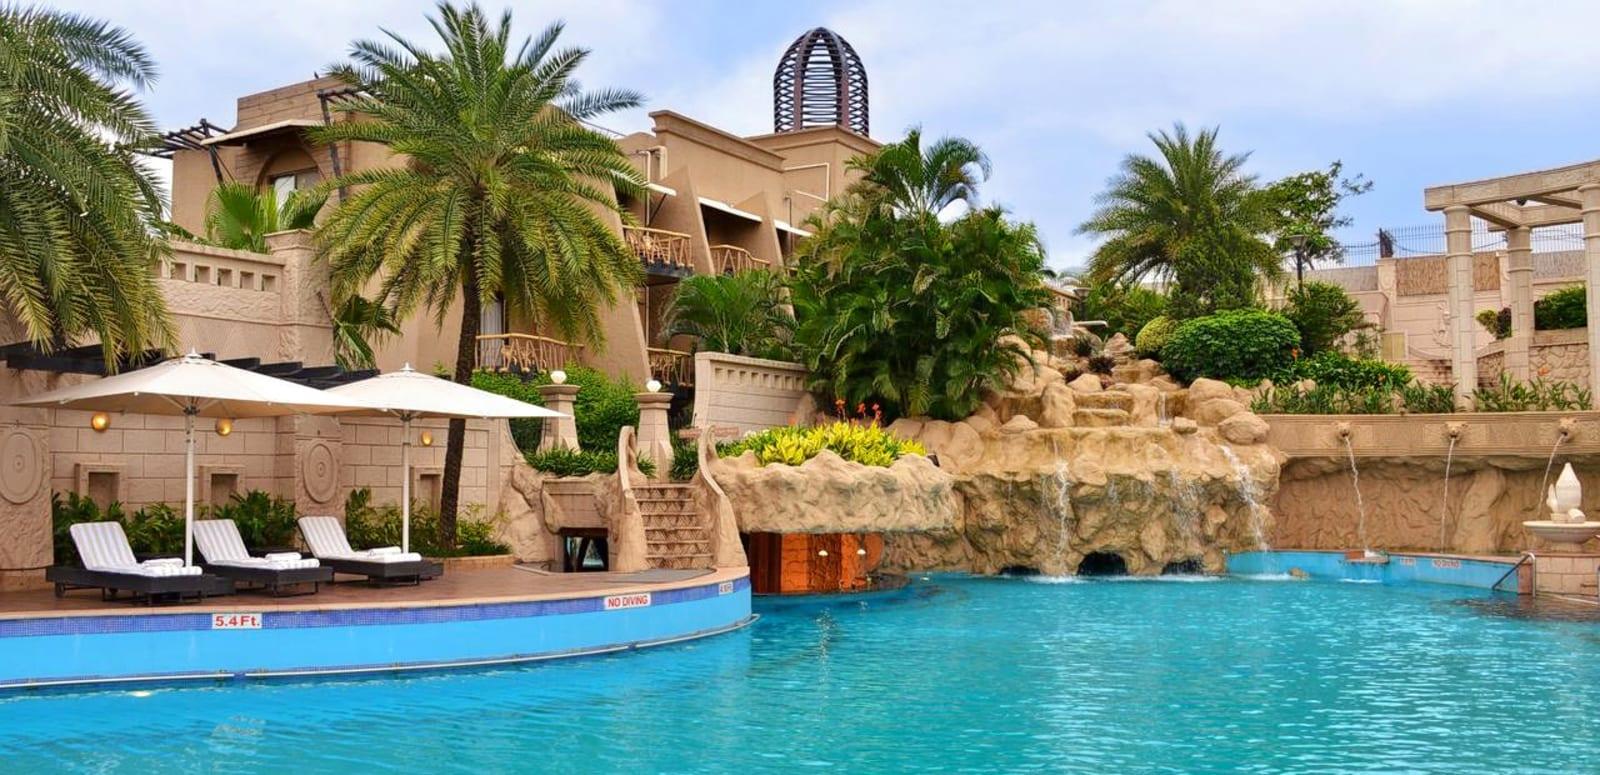 45 BEST Resorts near Pune - 2019 (Photos & 1783 Reviews)